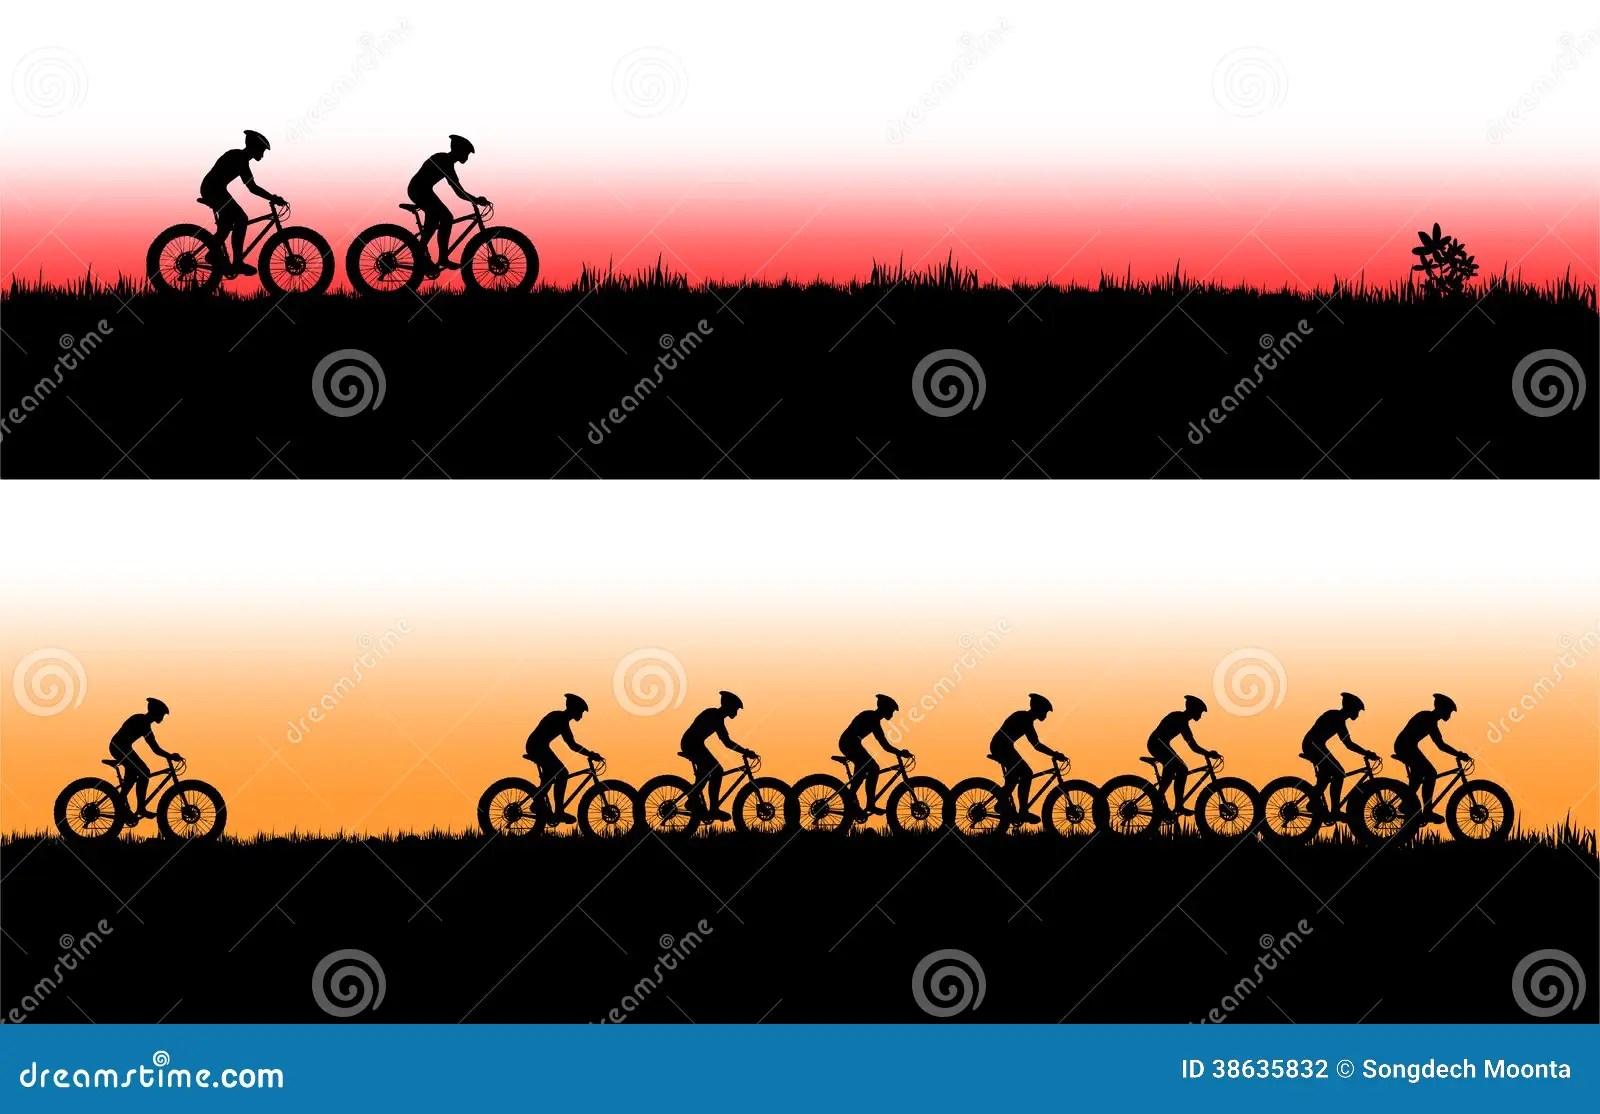 Mountain Bike Banner Stock Photography Image 38635832